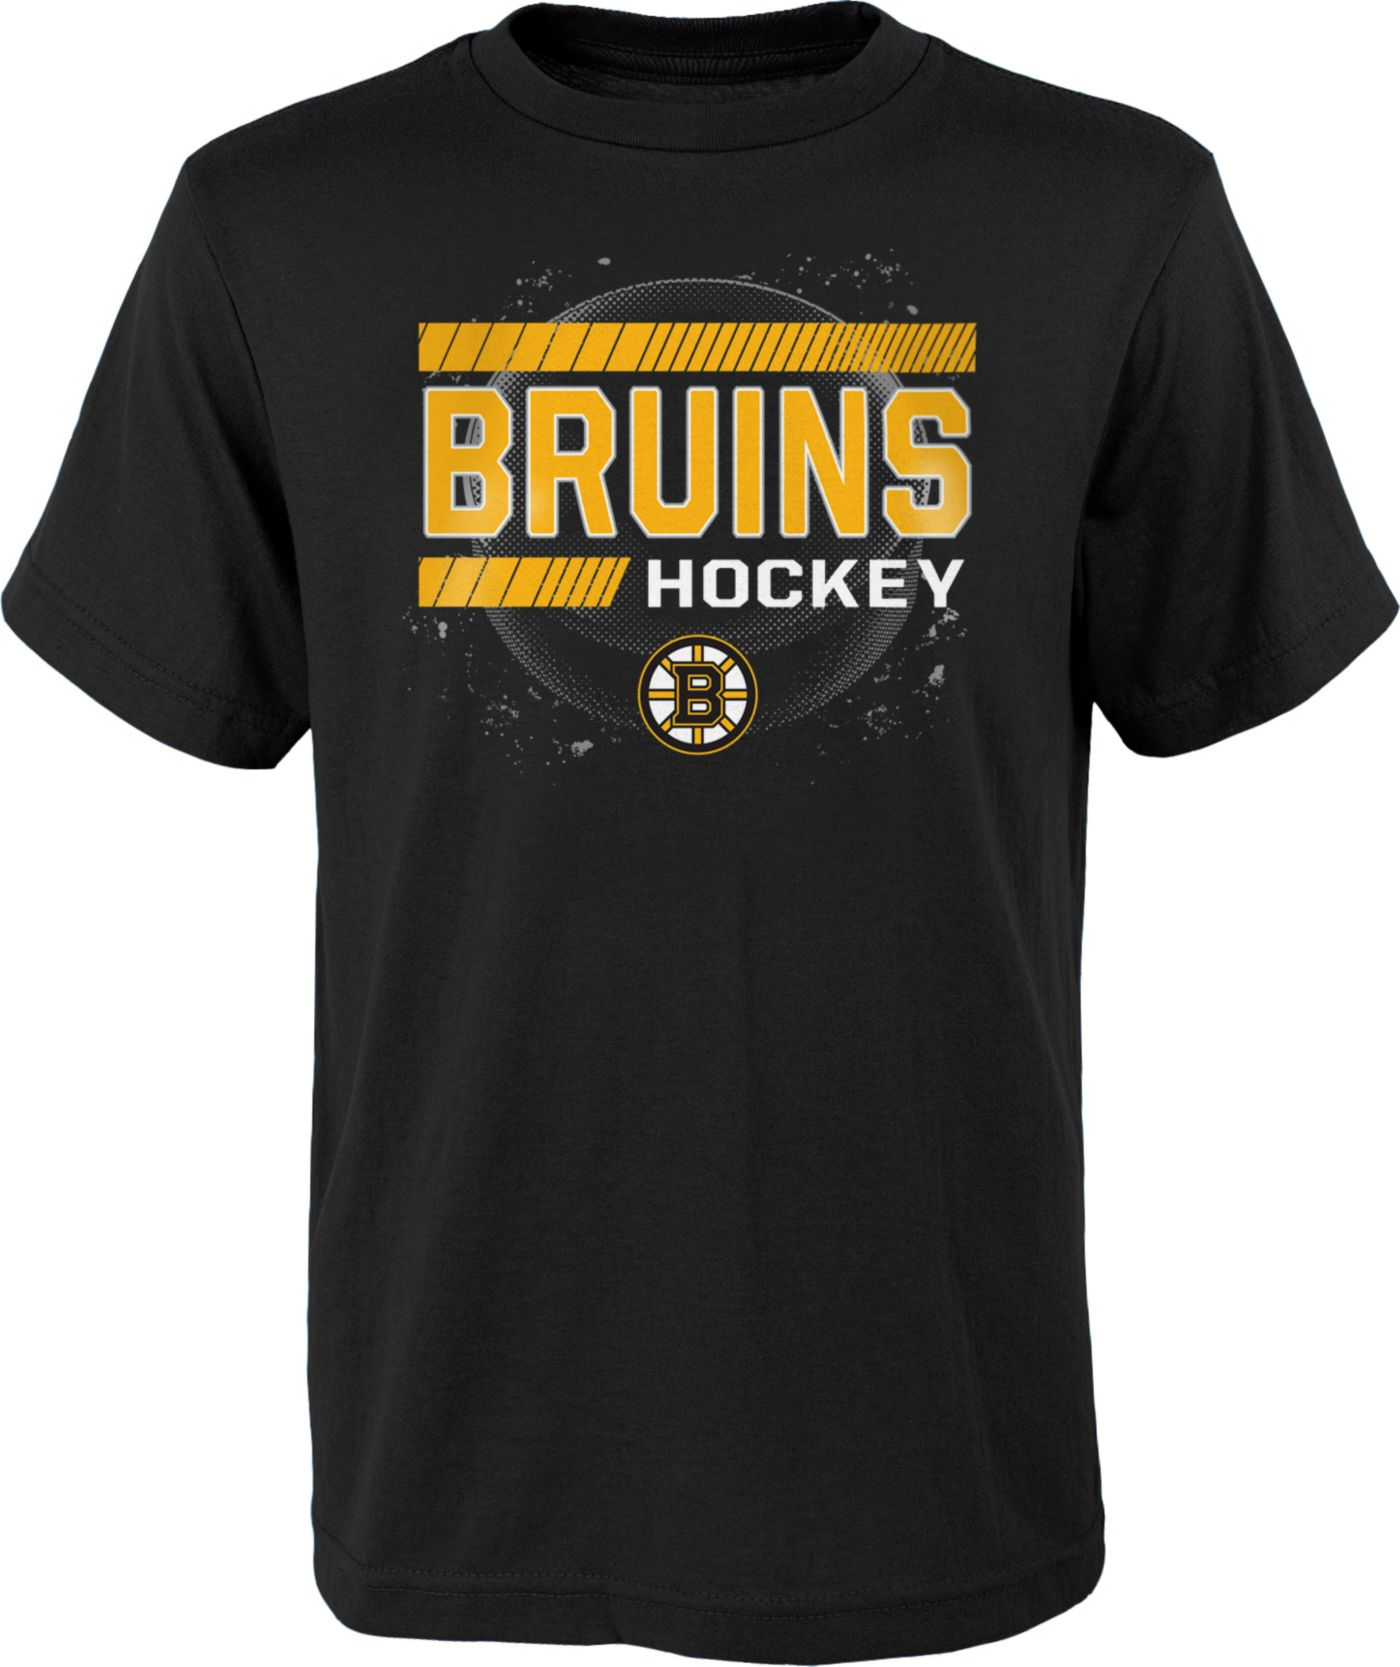 NHL Youth Boston Bruins The Zone Black T-Shirt